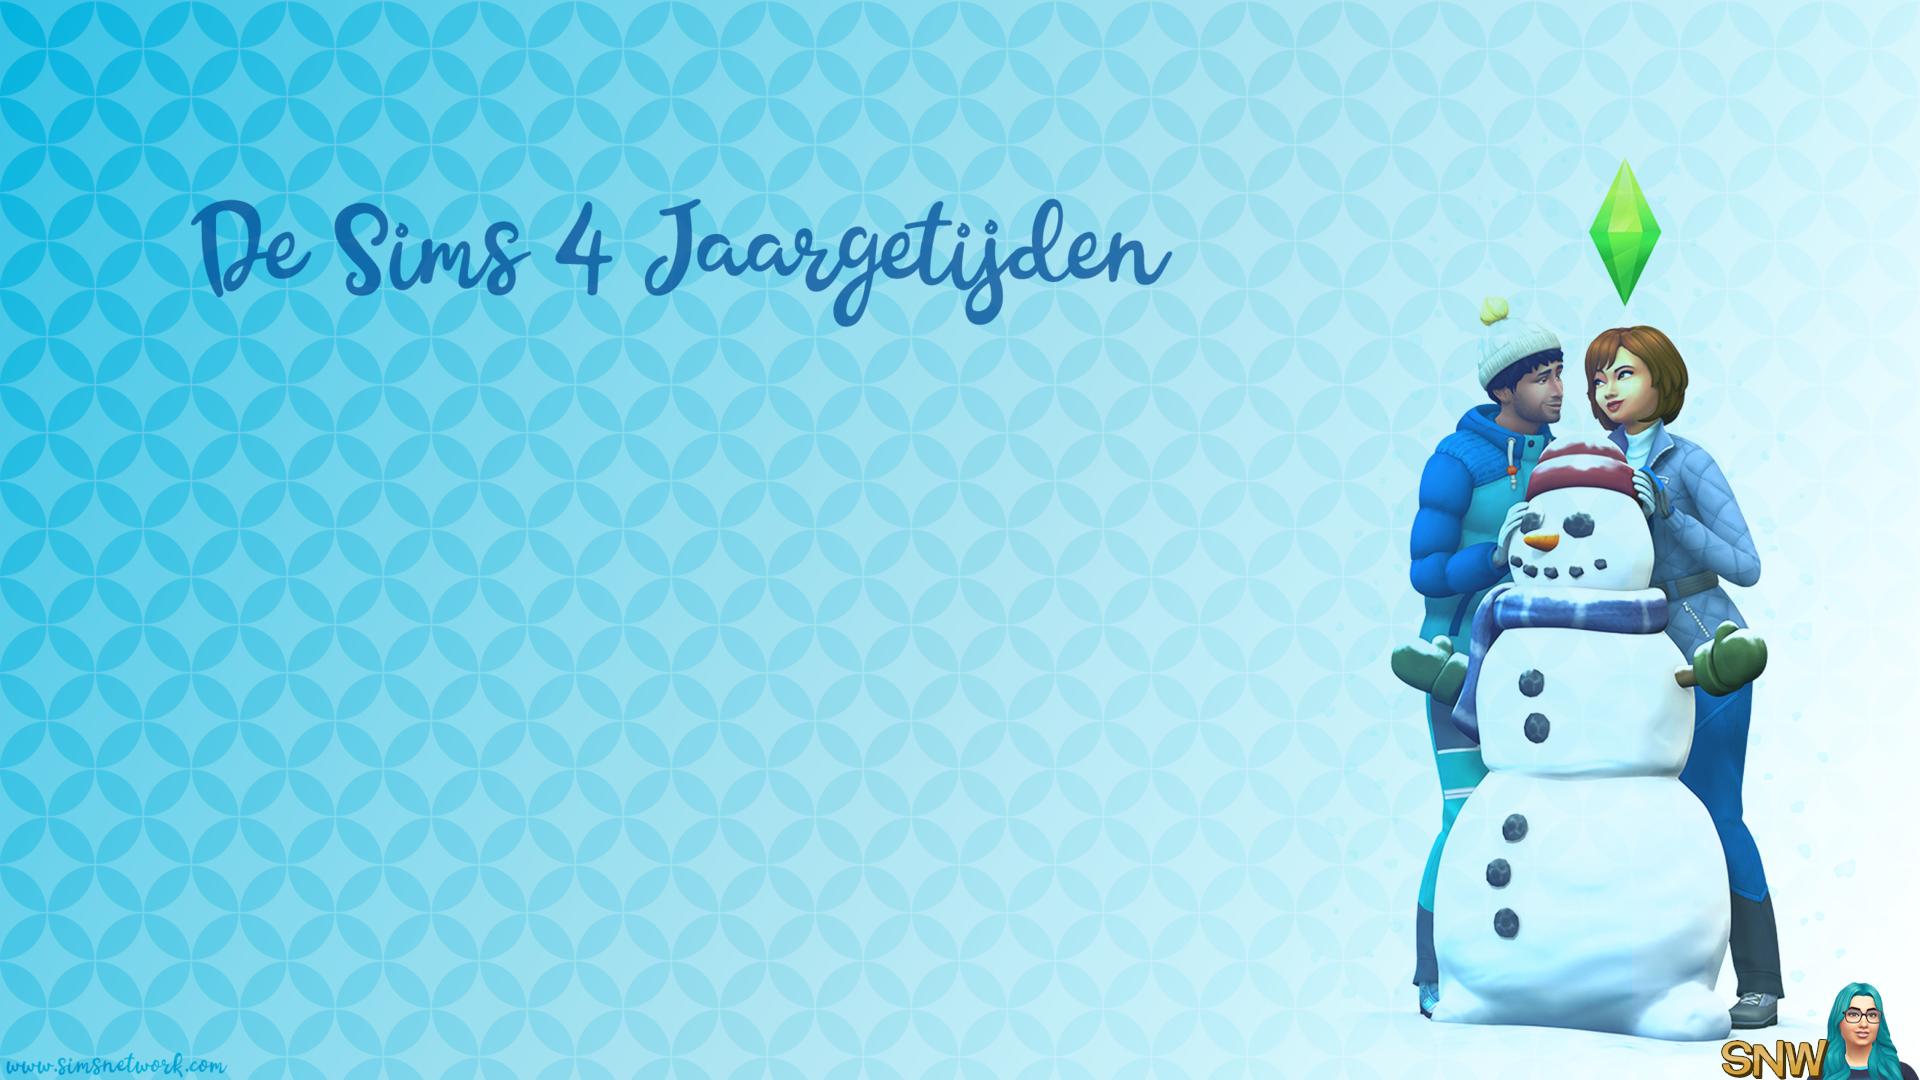 Seasons Winter Wallpapers Dutch Version Snw Games